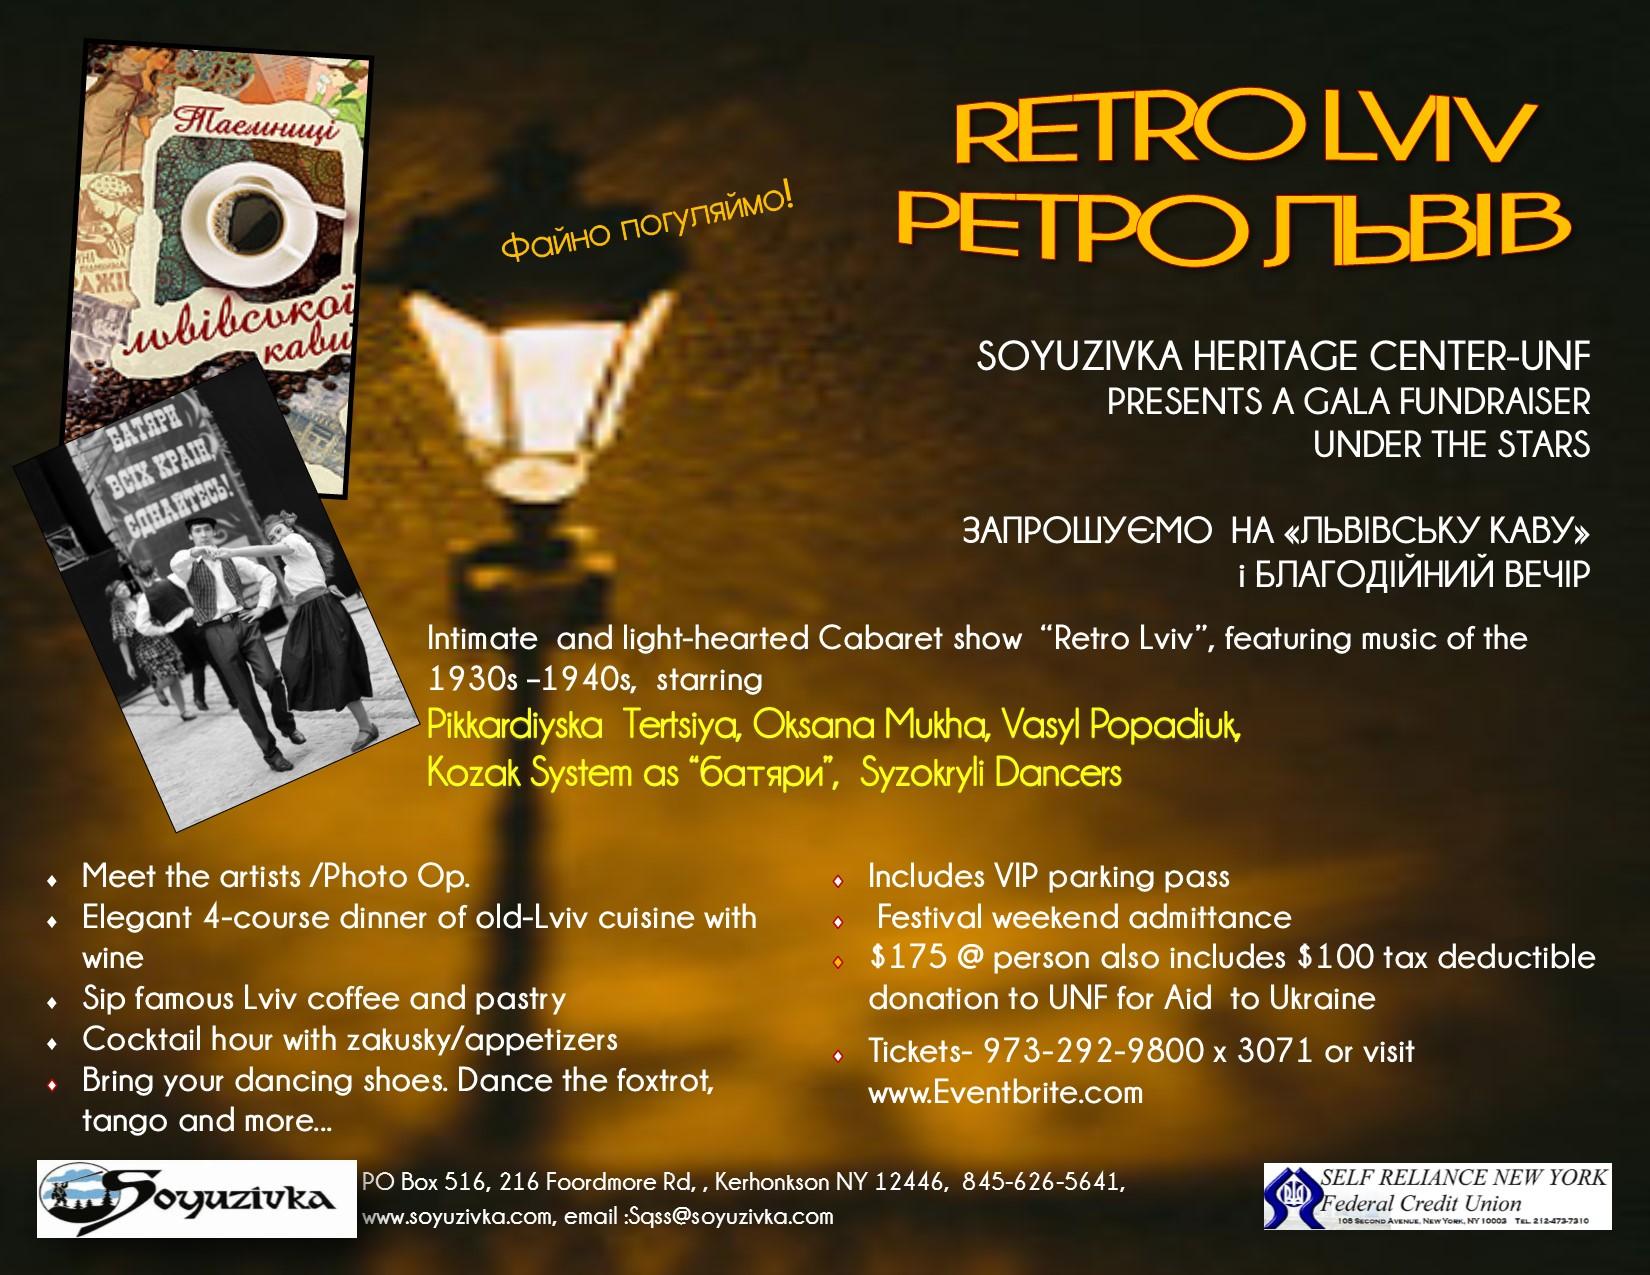 Retro Lviv at Soyuzivka-Fundraising Gala